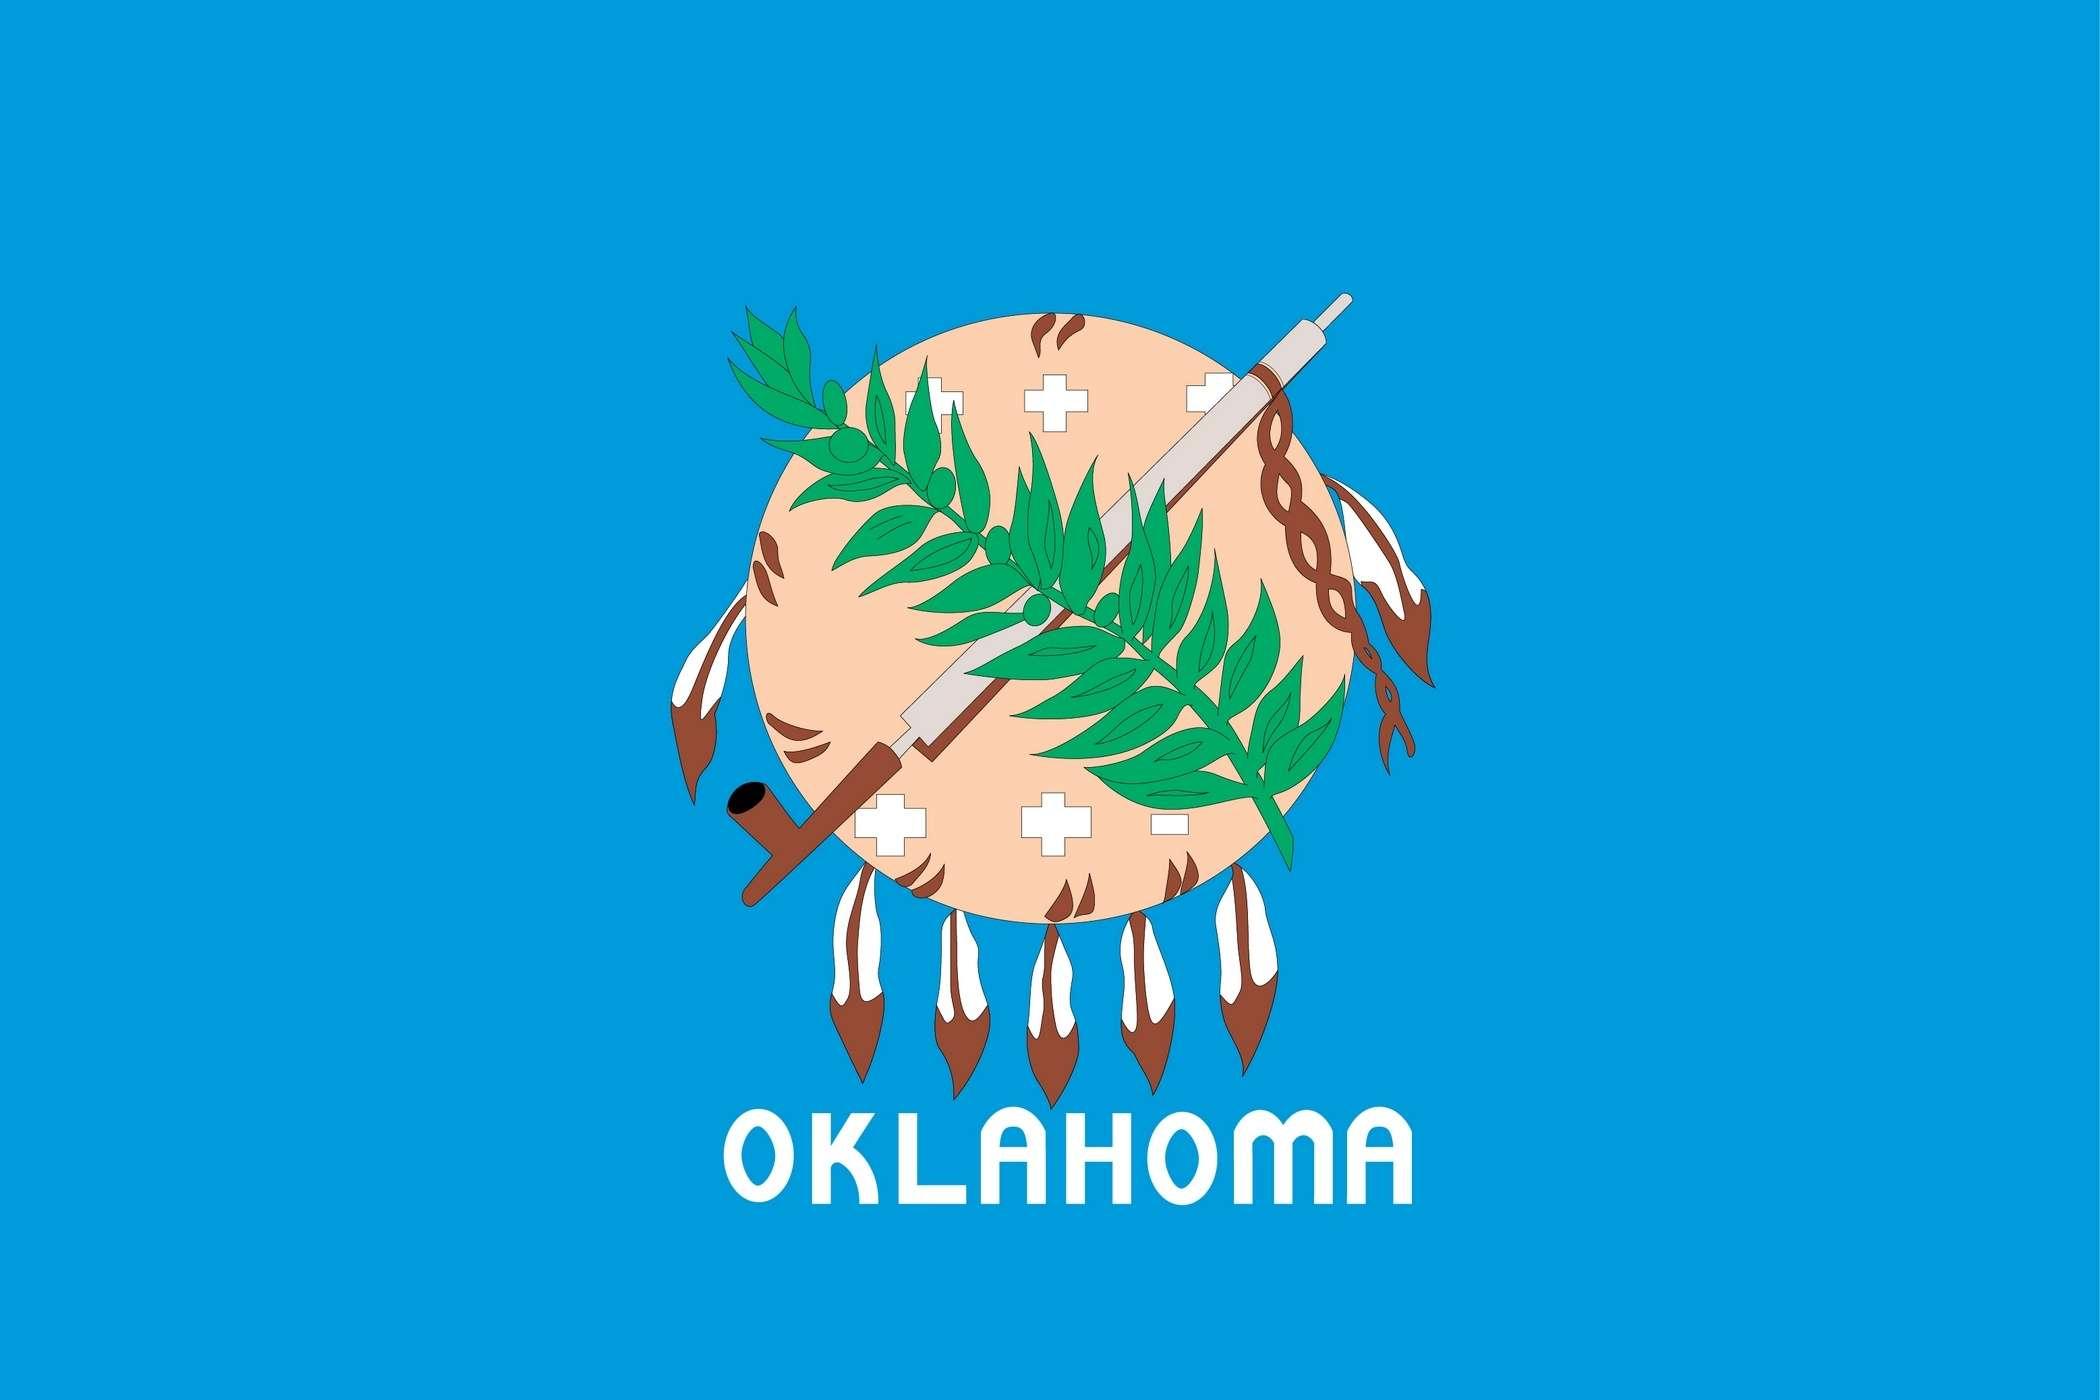 Oklahoma-State-Flag